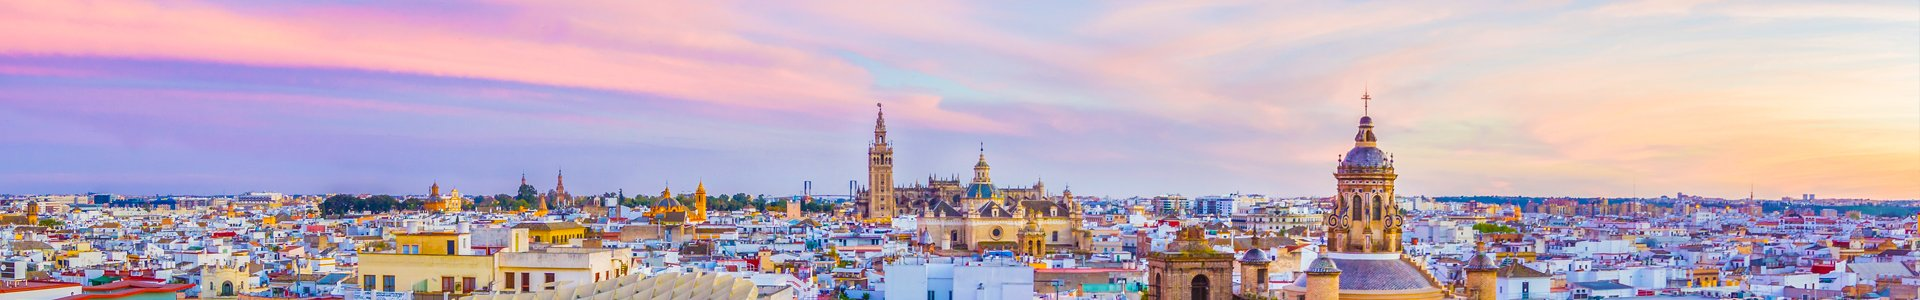 Sevilla vanaf Metropol Parasol, Spanje